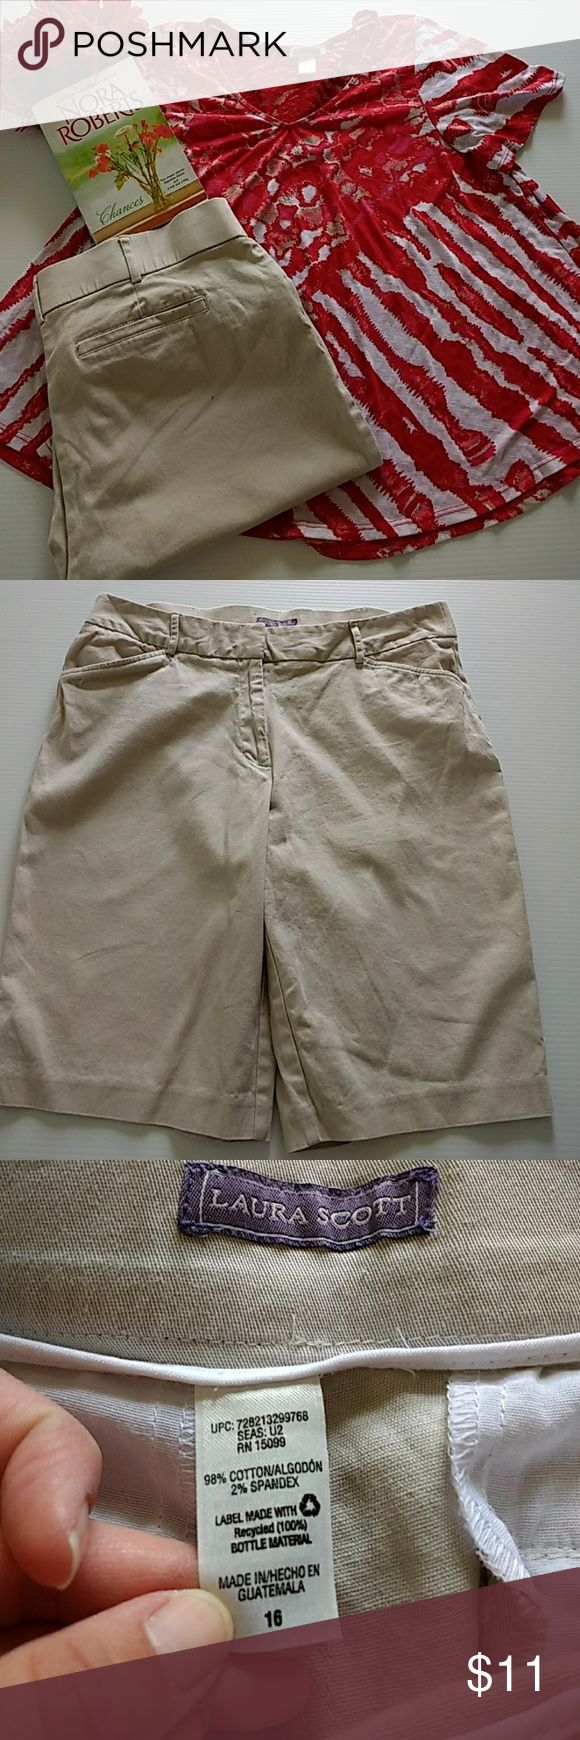 "Laura Scott bermudas size 16 Super cute Laura Scott bermudas size 16 🌸no gap waistband 🌸11"" rise 🌸11"" inseam Laura Scott Shorts Bermudas"